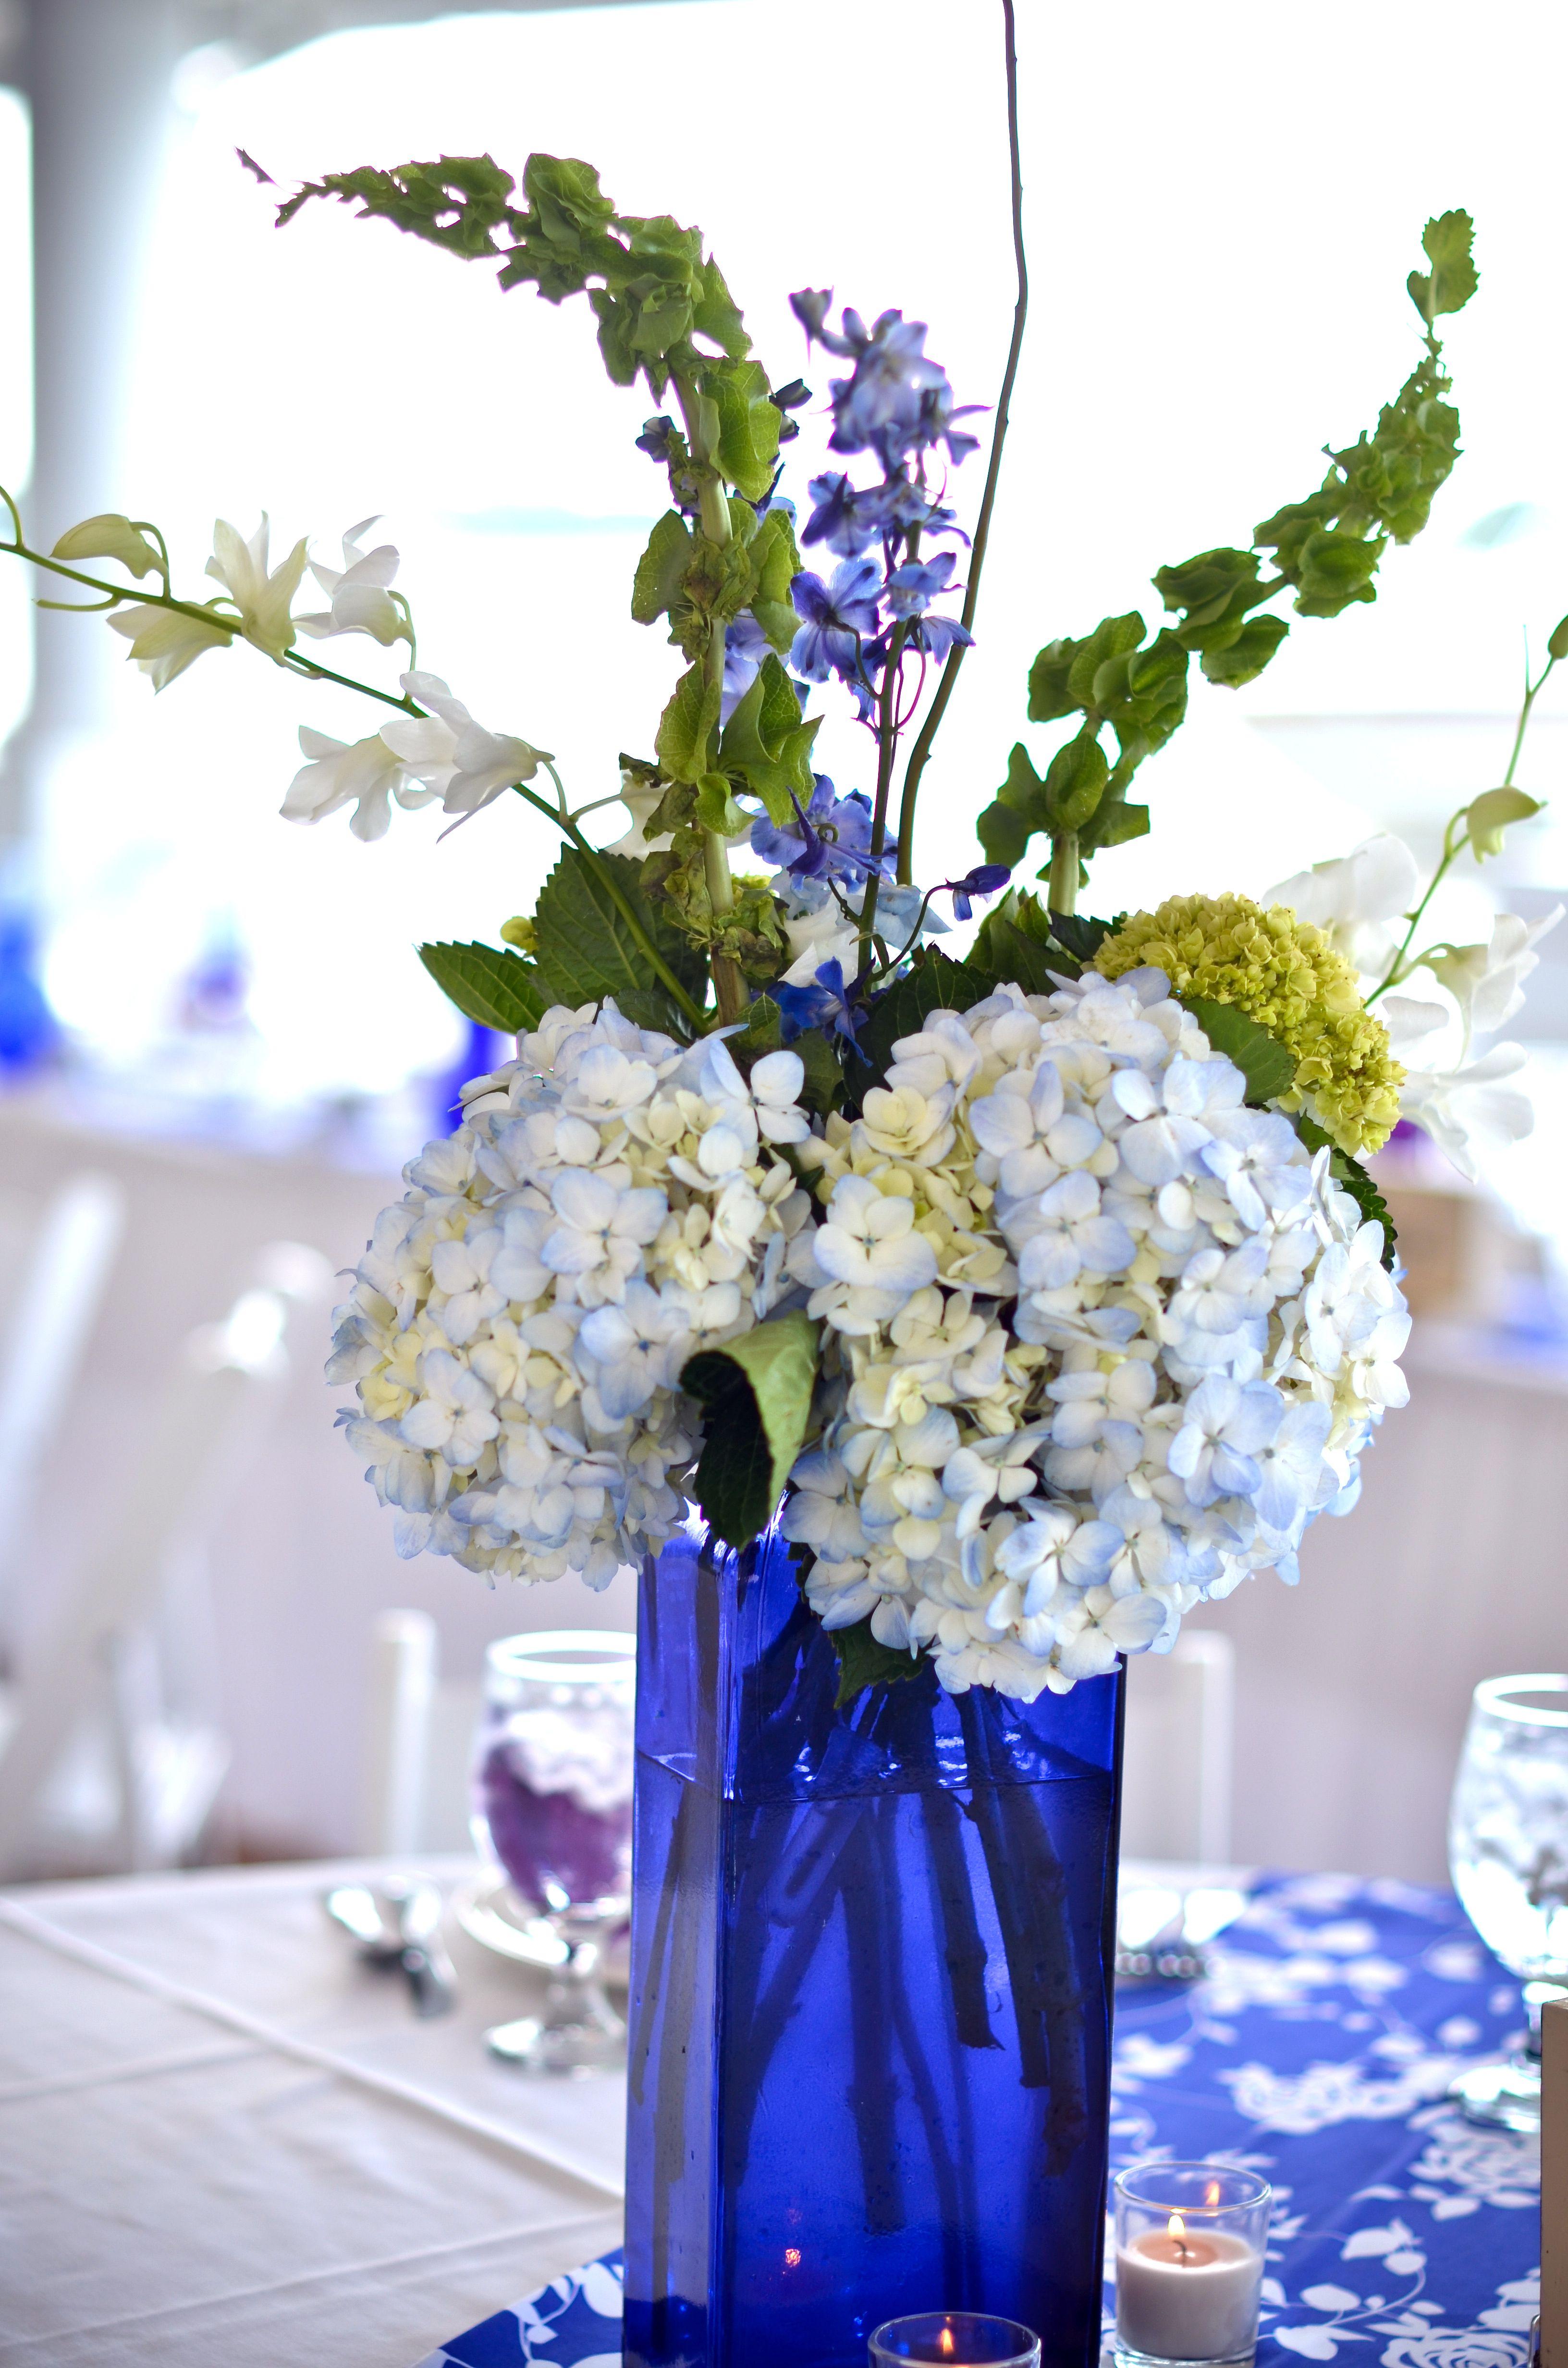 Pin By Laura Harvey On So Cute Blue Flower Arrangements Blue Wedding Centerpieces Blue Wedding Decorations